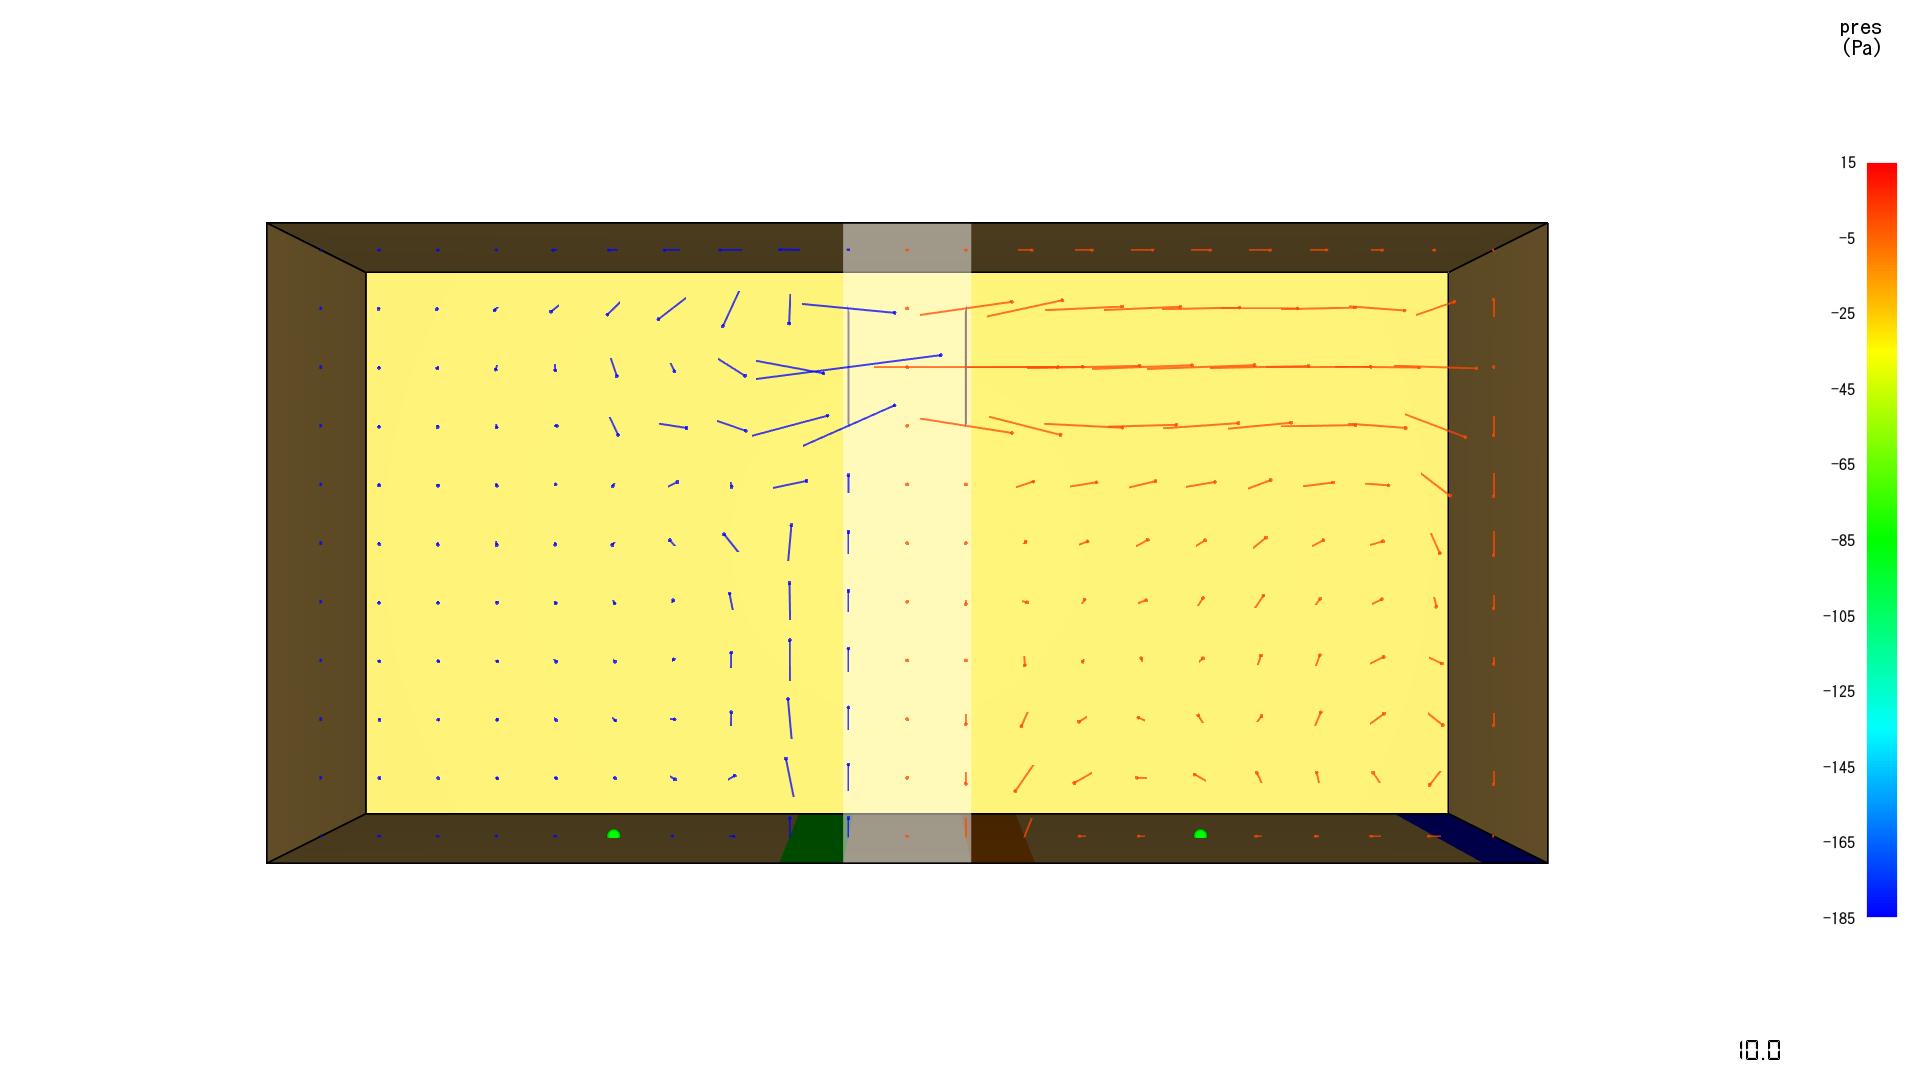 results scrn leakage leak test 2 vel vectors